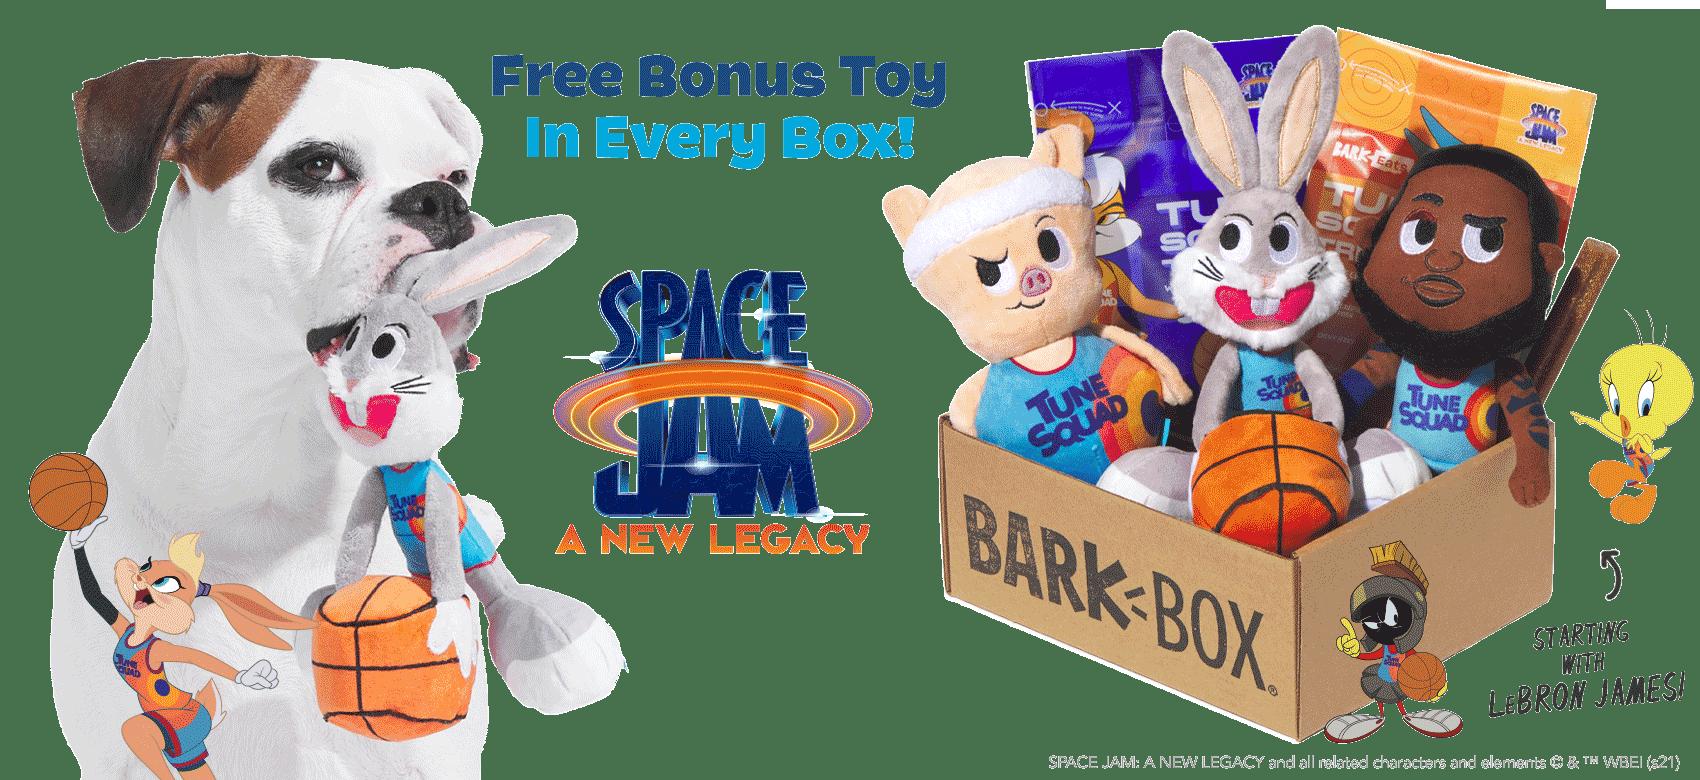 BarkBox Coupon Code: Free Bonus Toy in Every Box!